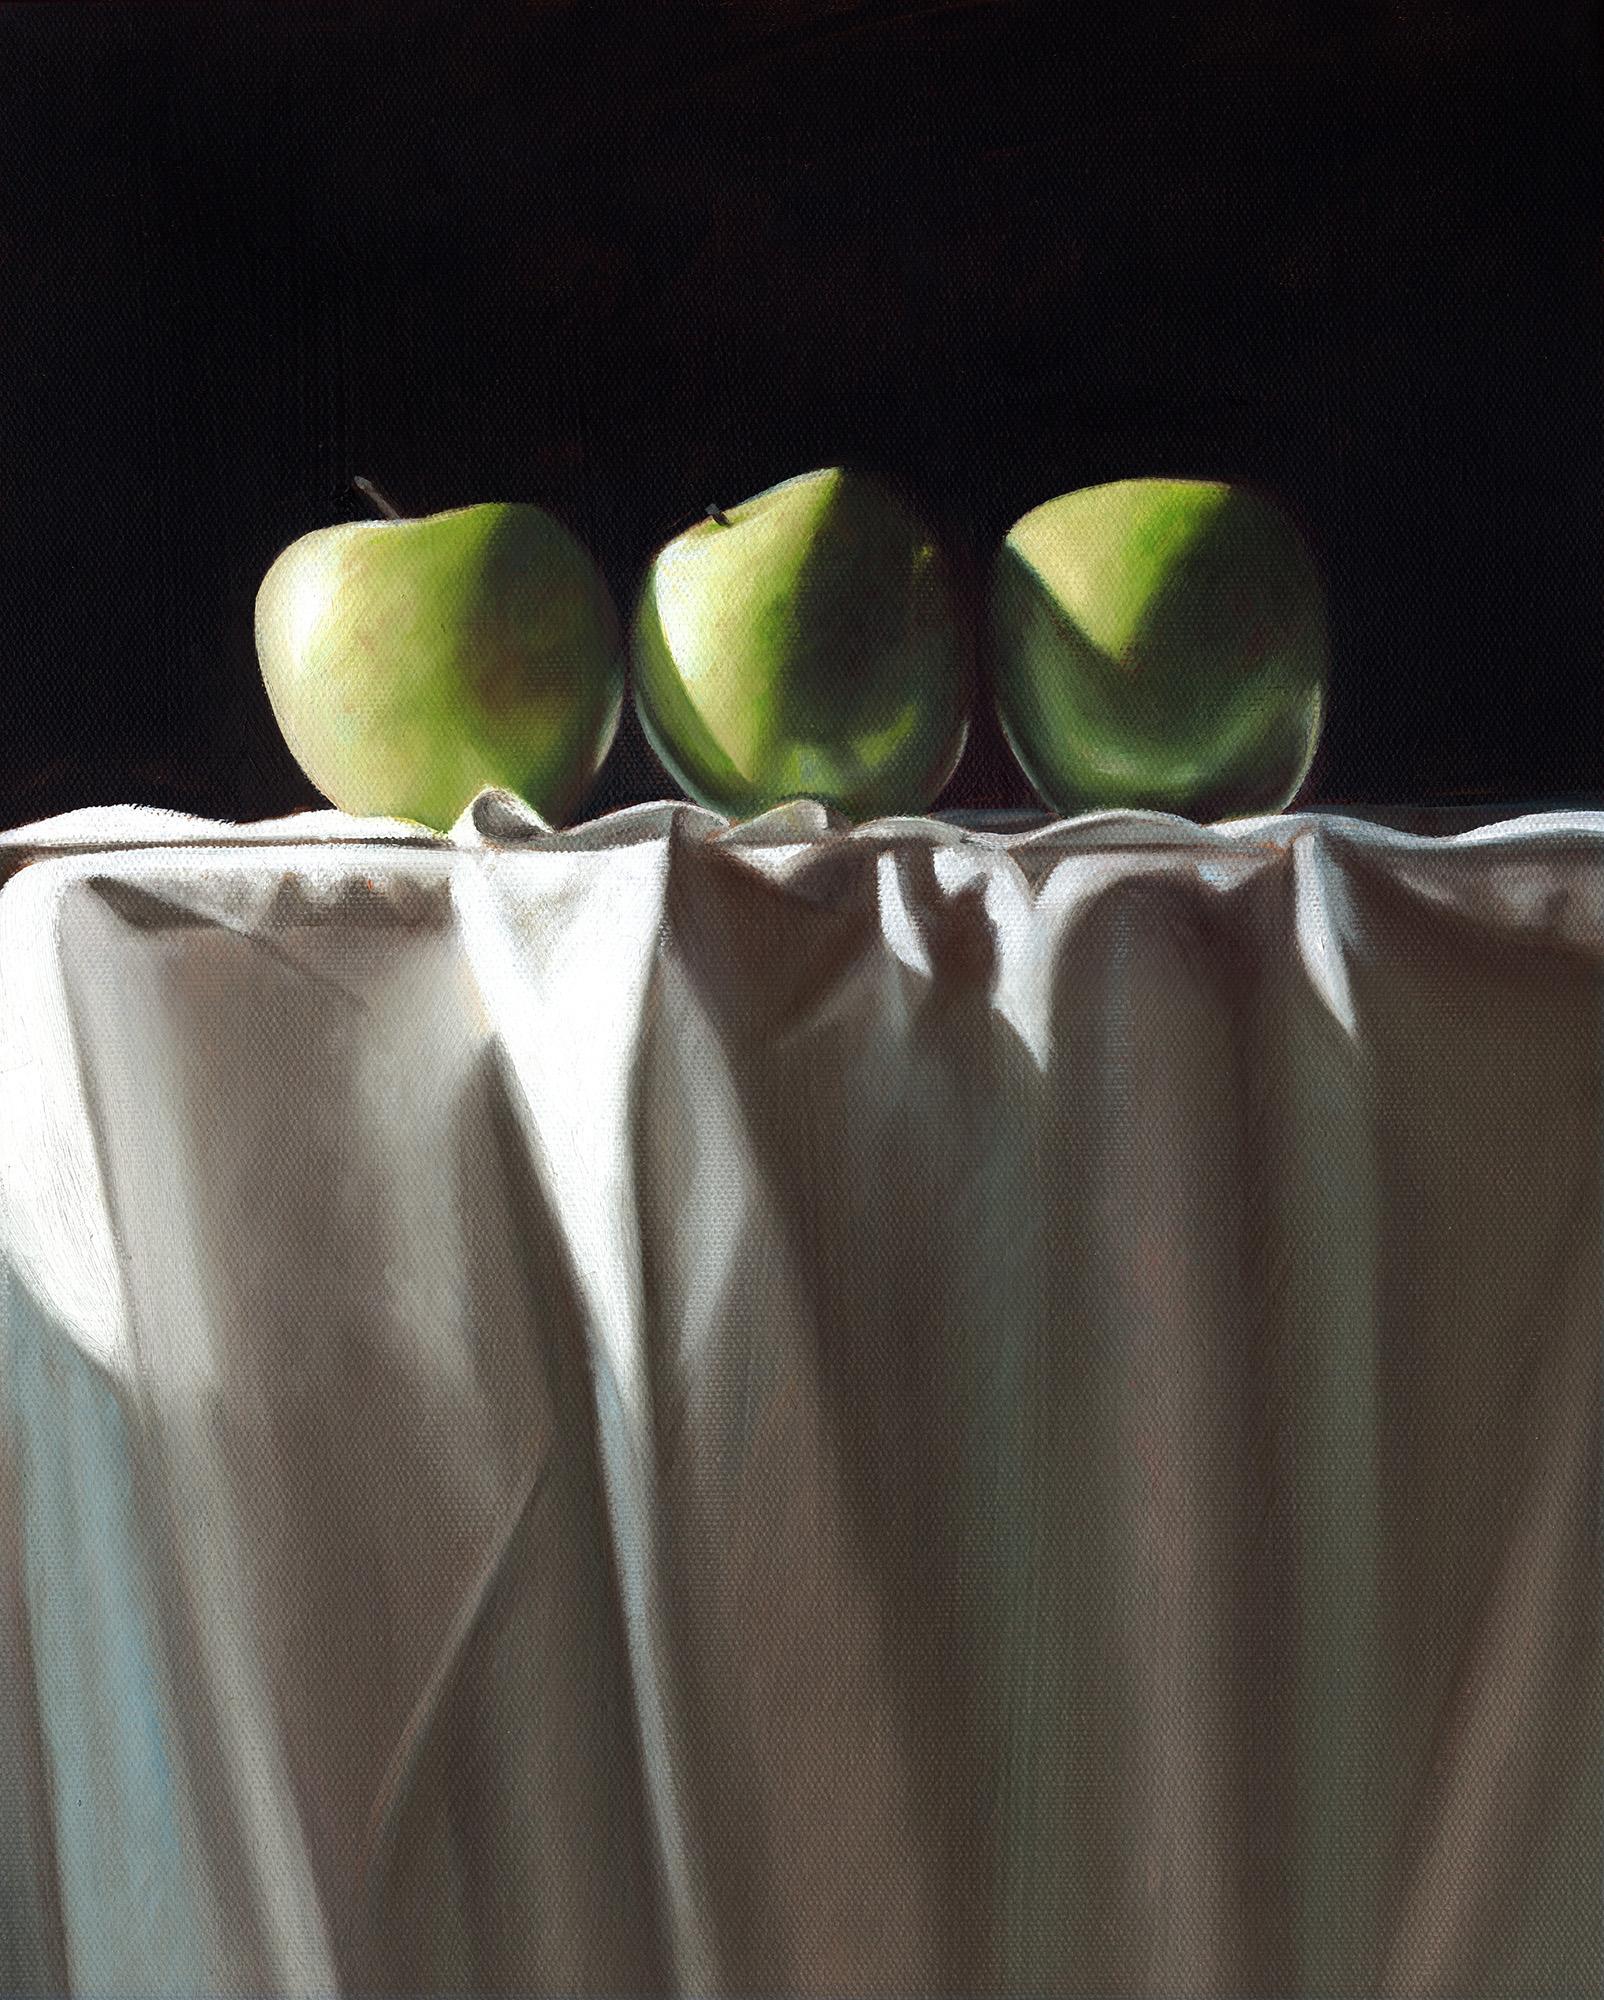 Three Apples | 12 x 16 | Oil on canvas